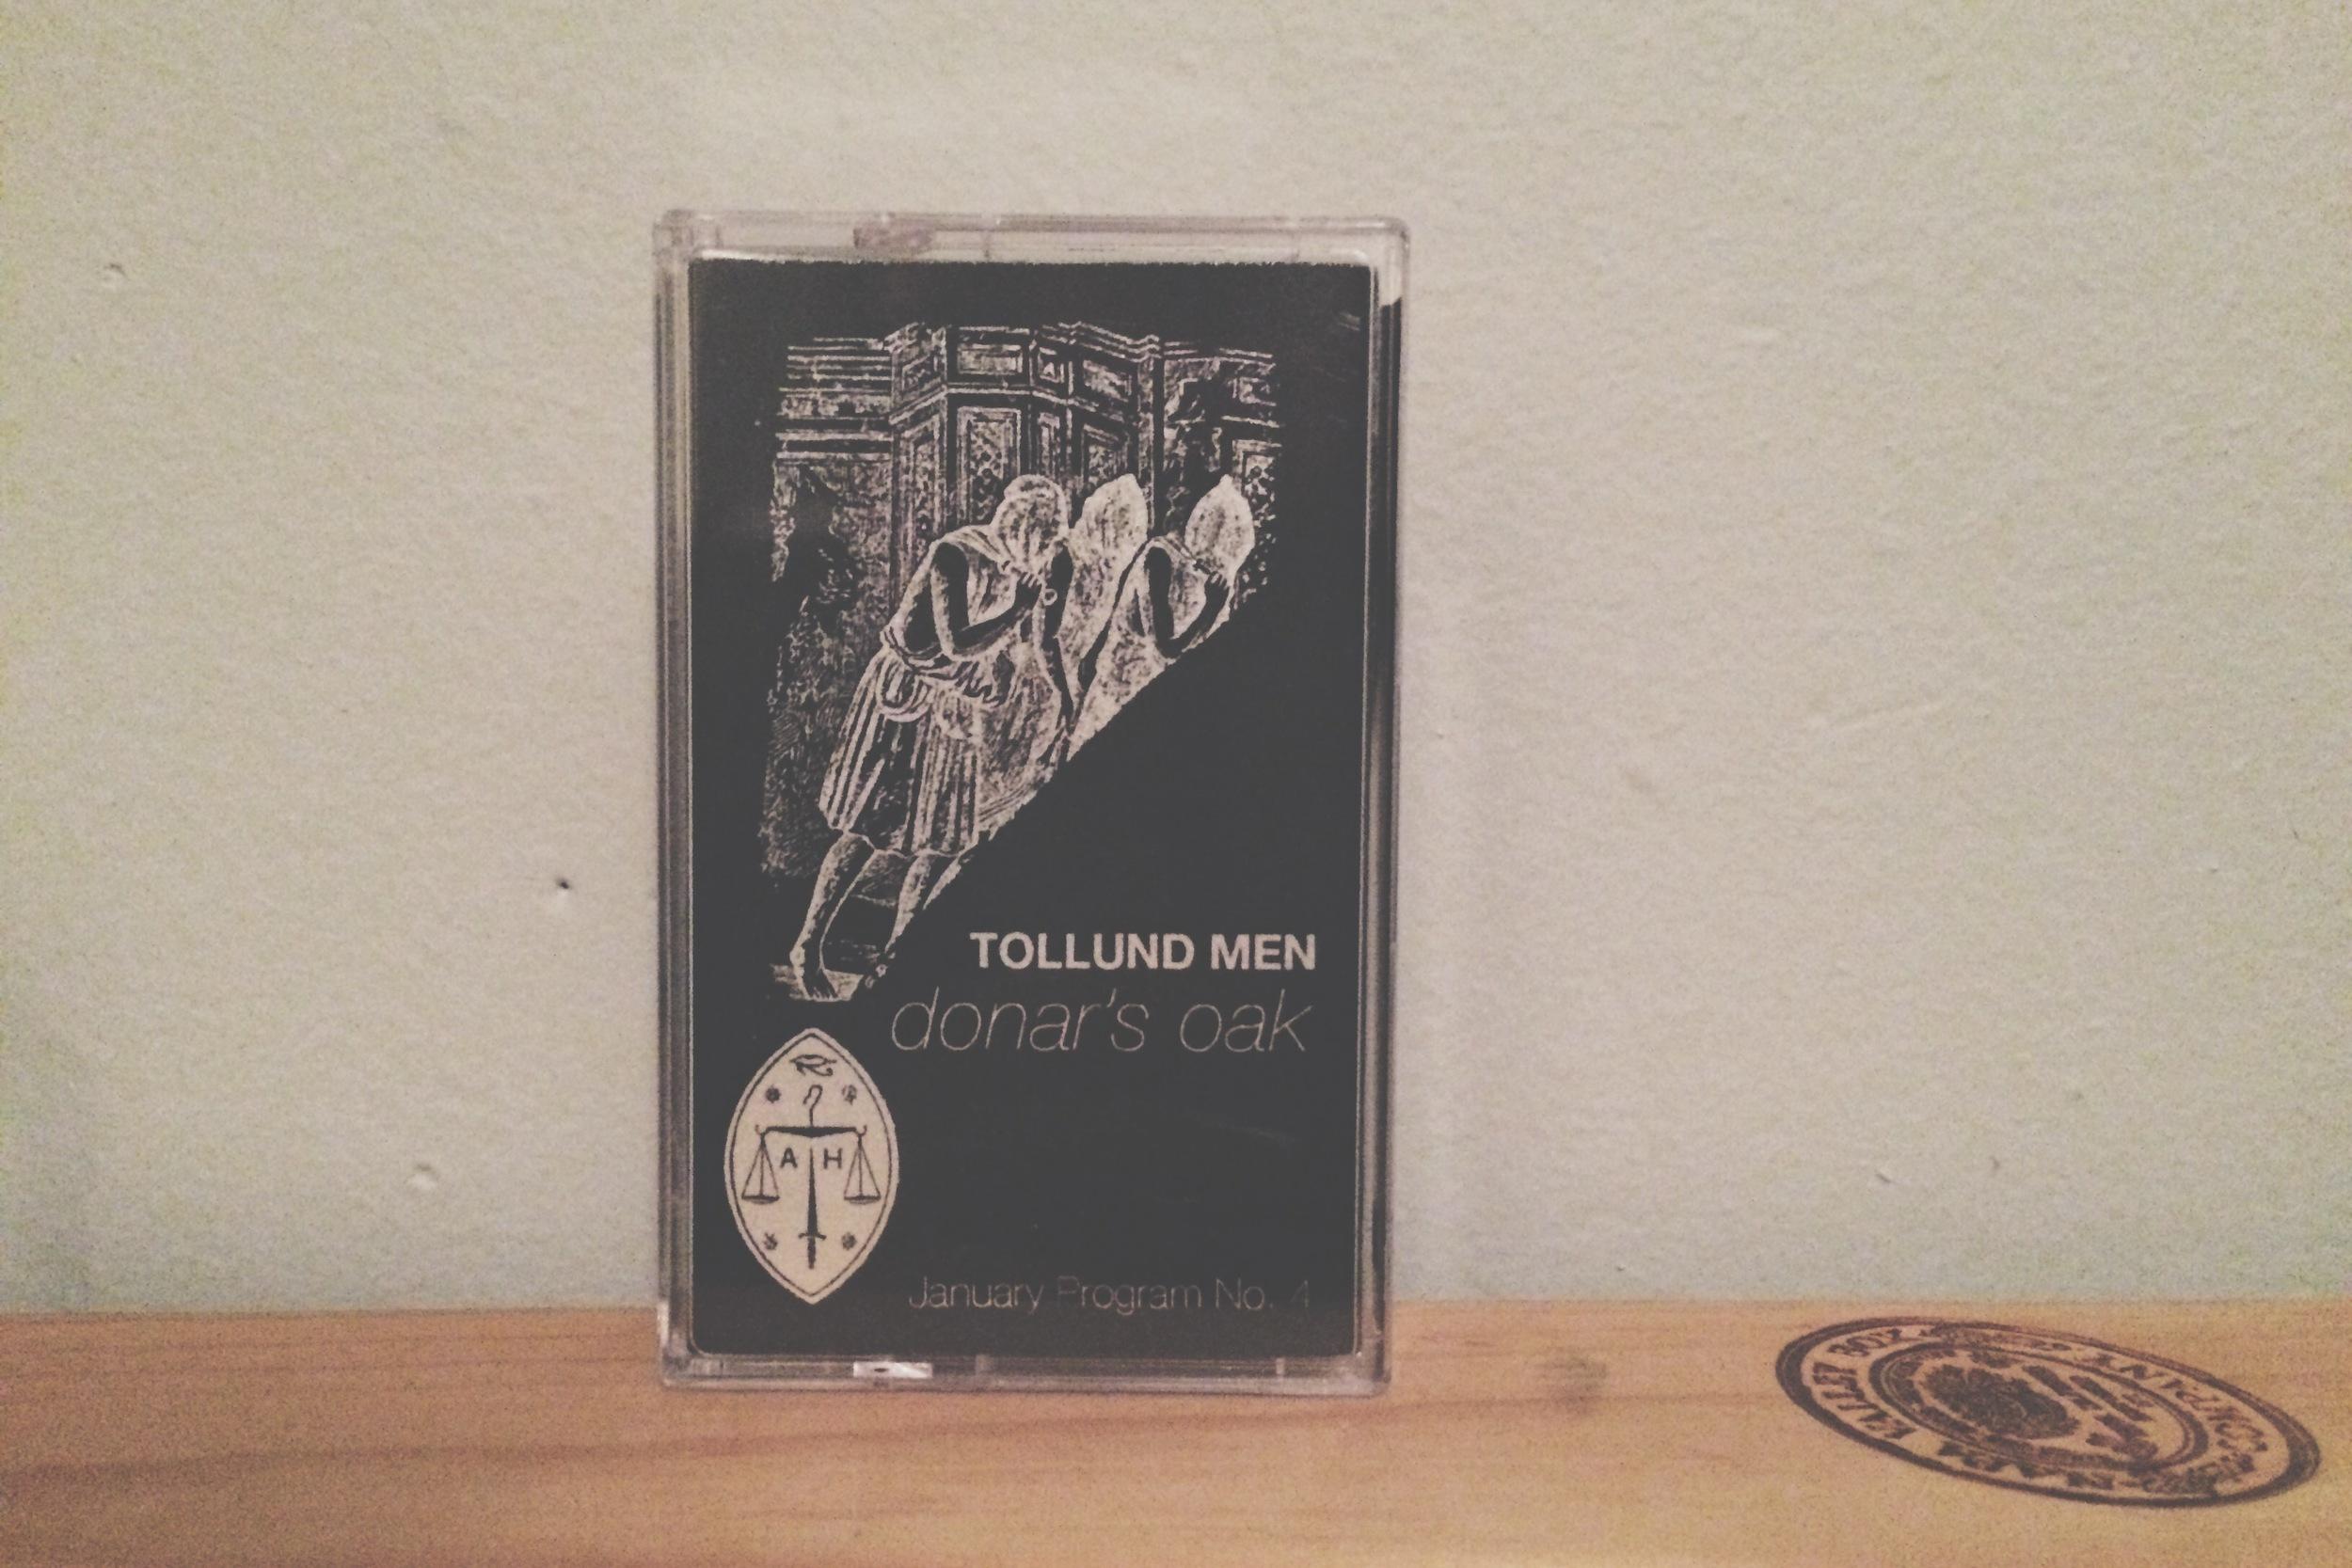 1 07. Tollund Men - Donar's Cloak.jpg